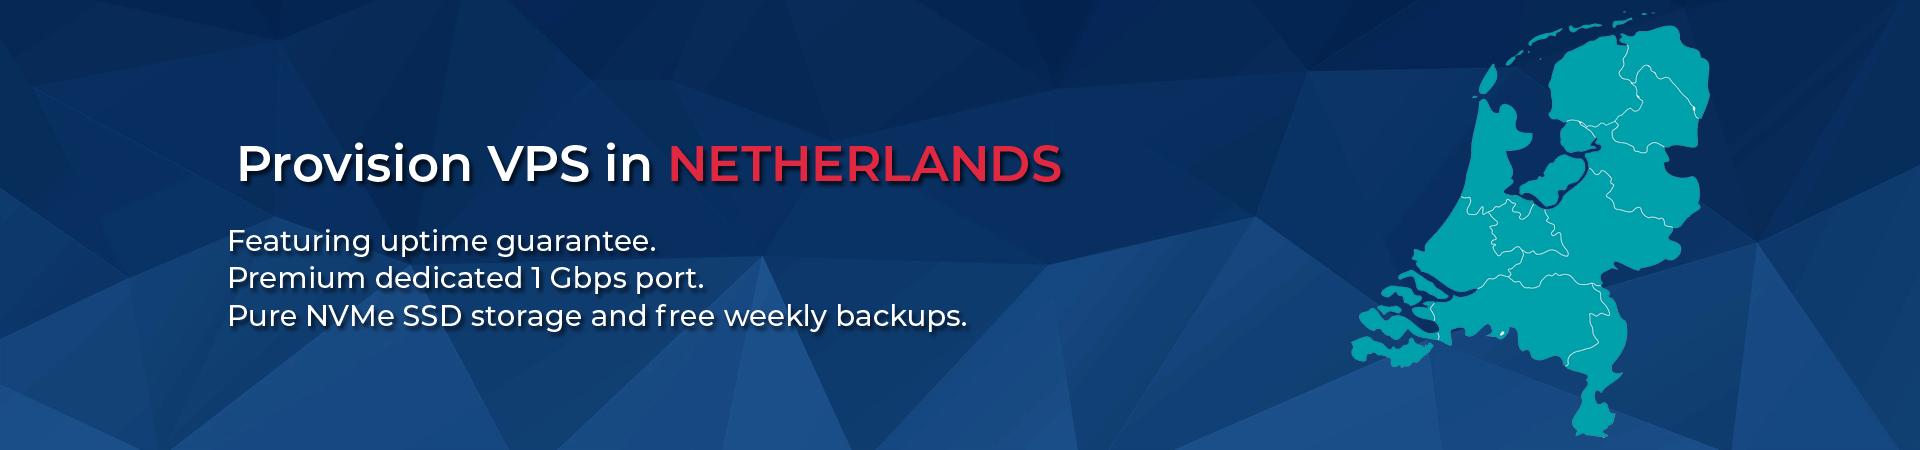 VPS in NETHERLANDS